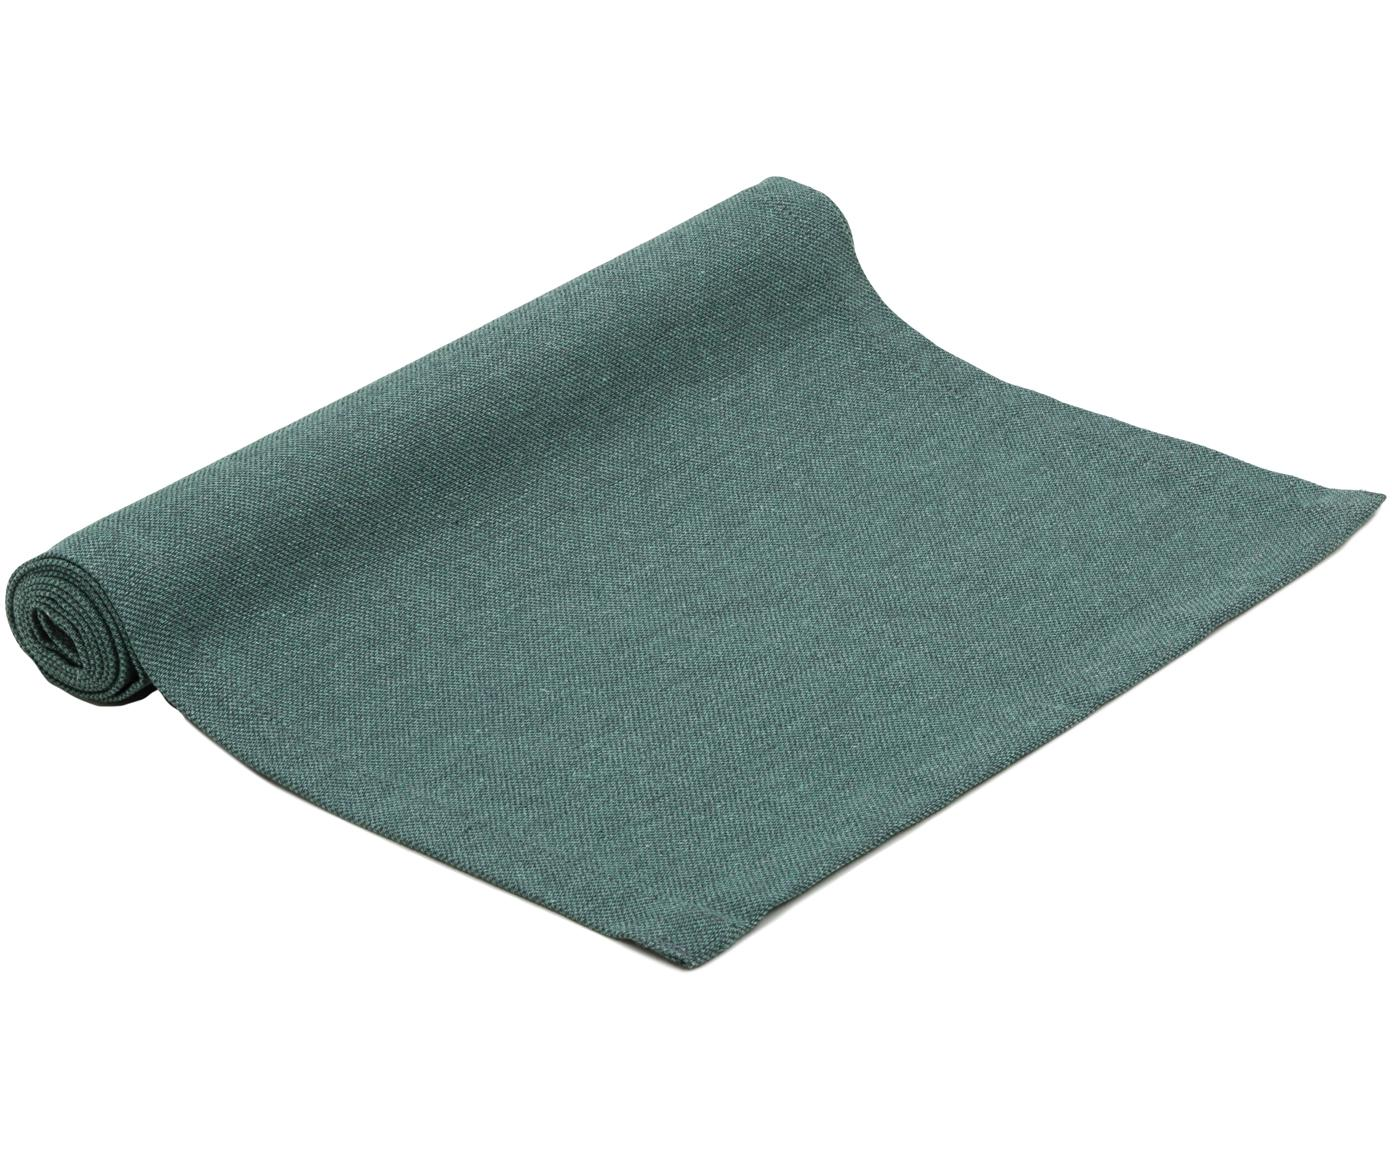 Tafelloper Riva, 55%katoen, 45%polyester, Petrol, 40 x 150 cm